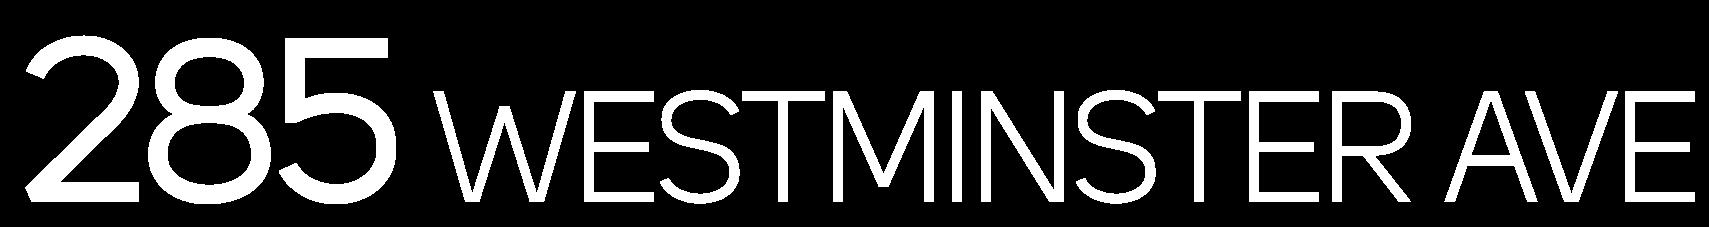 285 Westminster Commercial logo